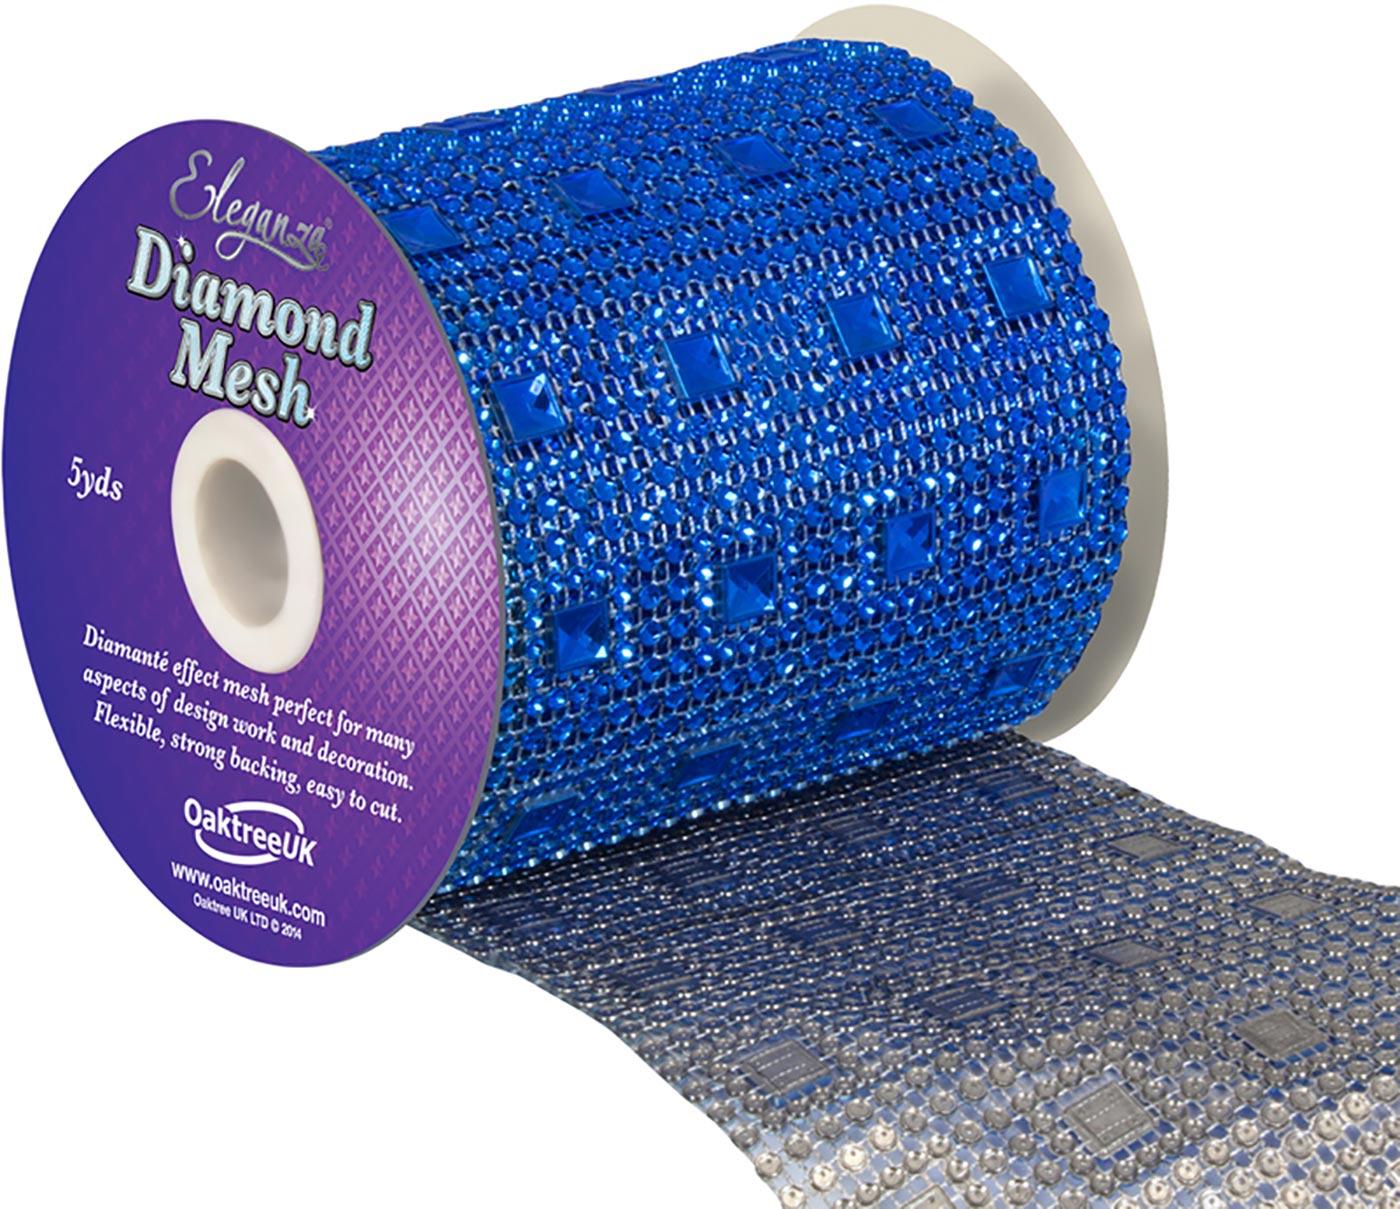 Eleganza Diamond Mesh 11cm x 4.5m Pattern No.351 Sapphire Blue